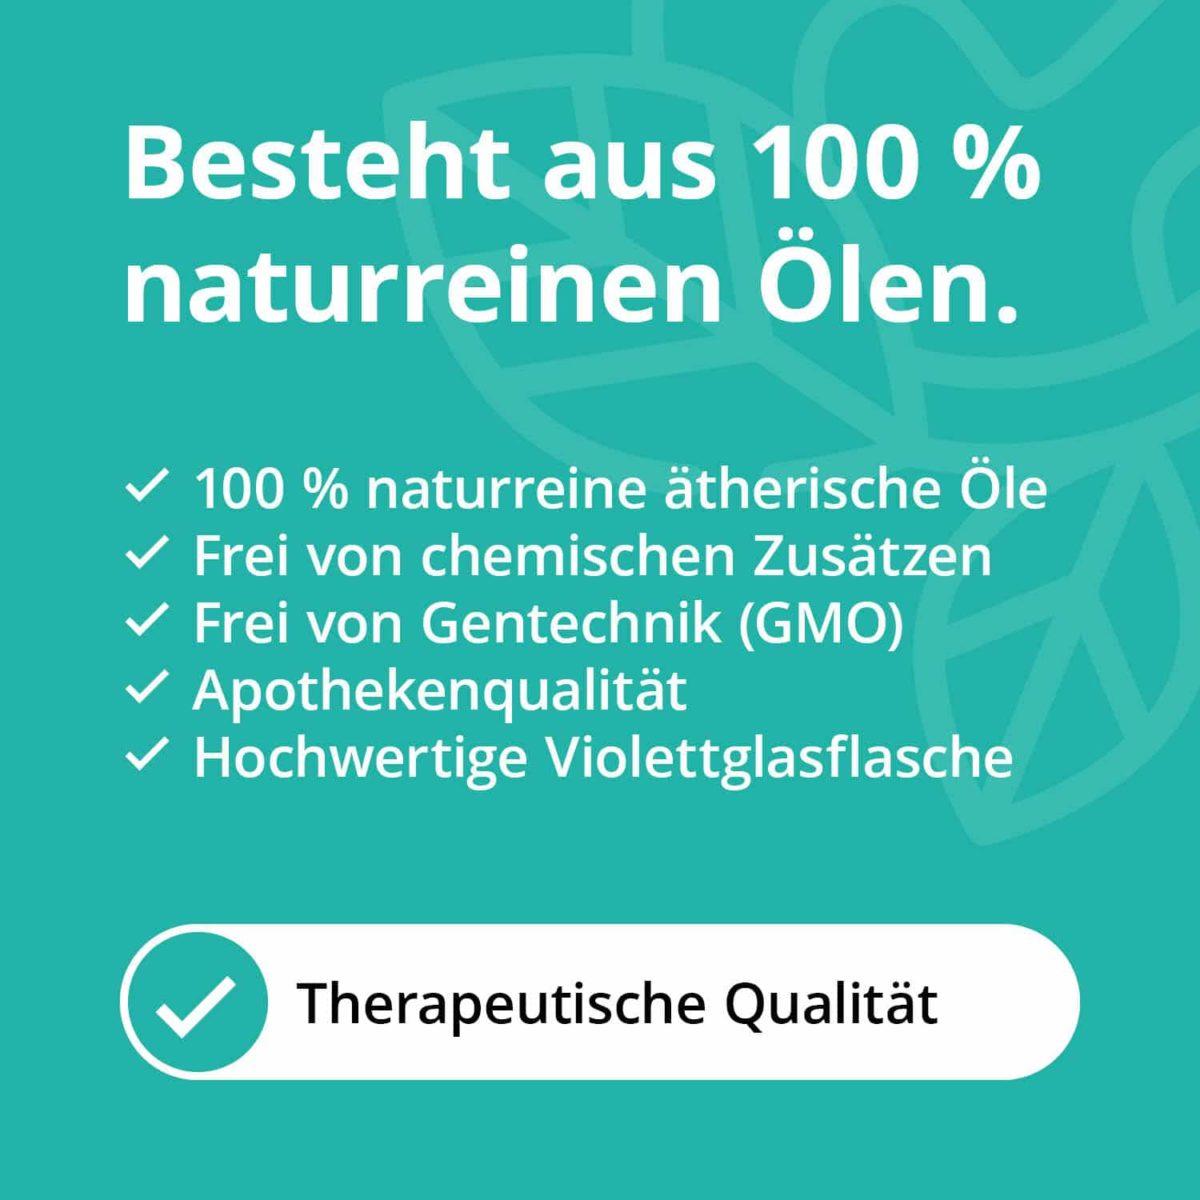 Casida Focusing Aroma-Blend Konzentration & Fokus - 5 ml 17377200 PZN Apotheke Energie Gedächtnis Aromatherapie Aromapflege Aromaschmuck Diffuser5